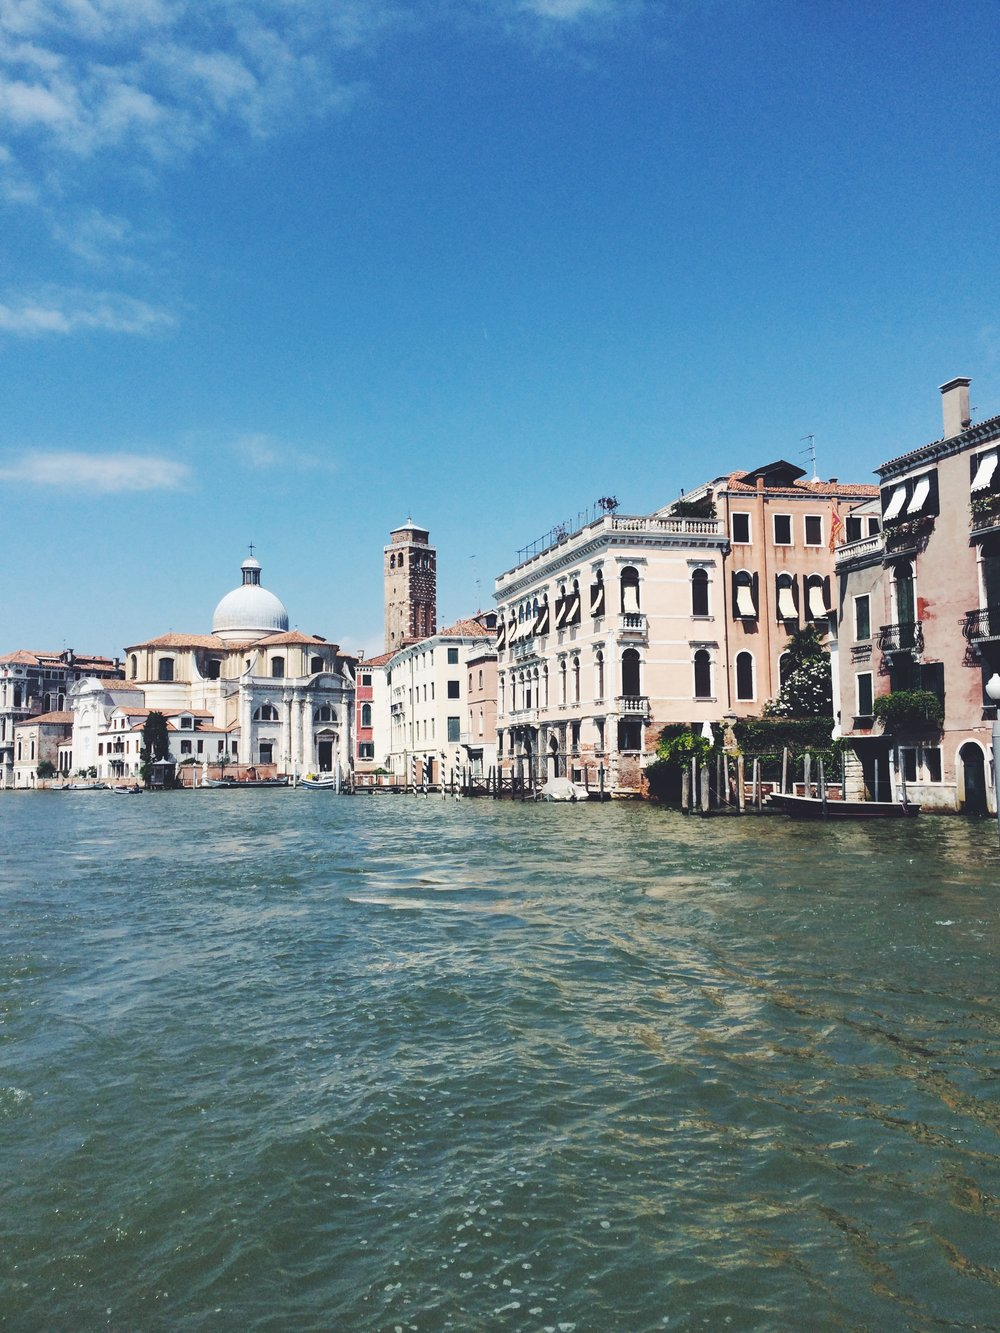 Belmond Cipriani The Creative Larder Venice